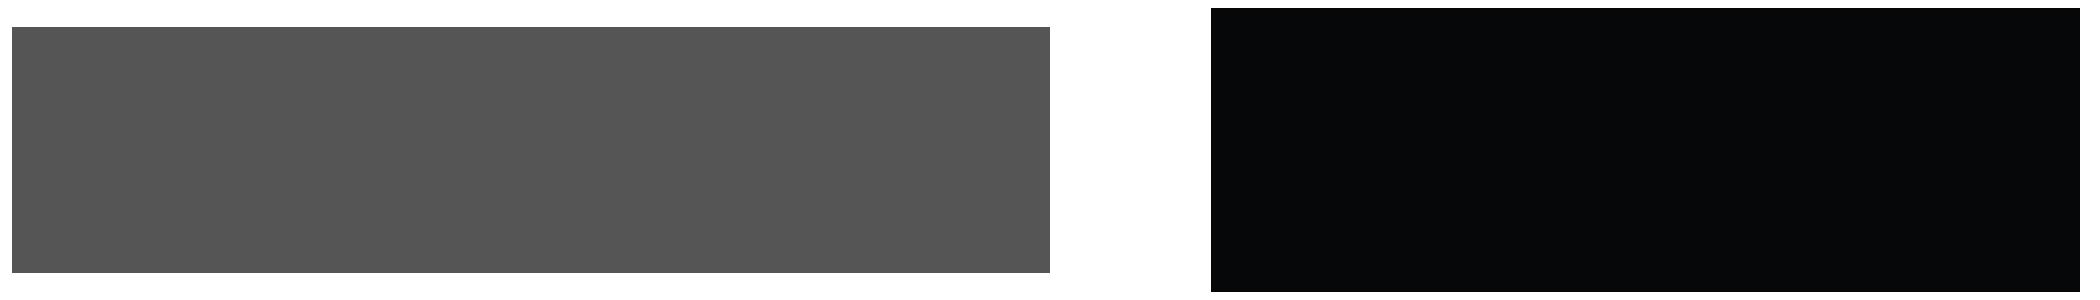 mmb-seabolt-wide-logos